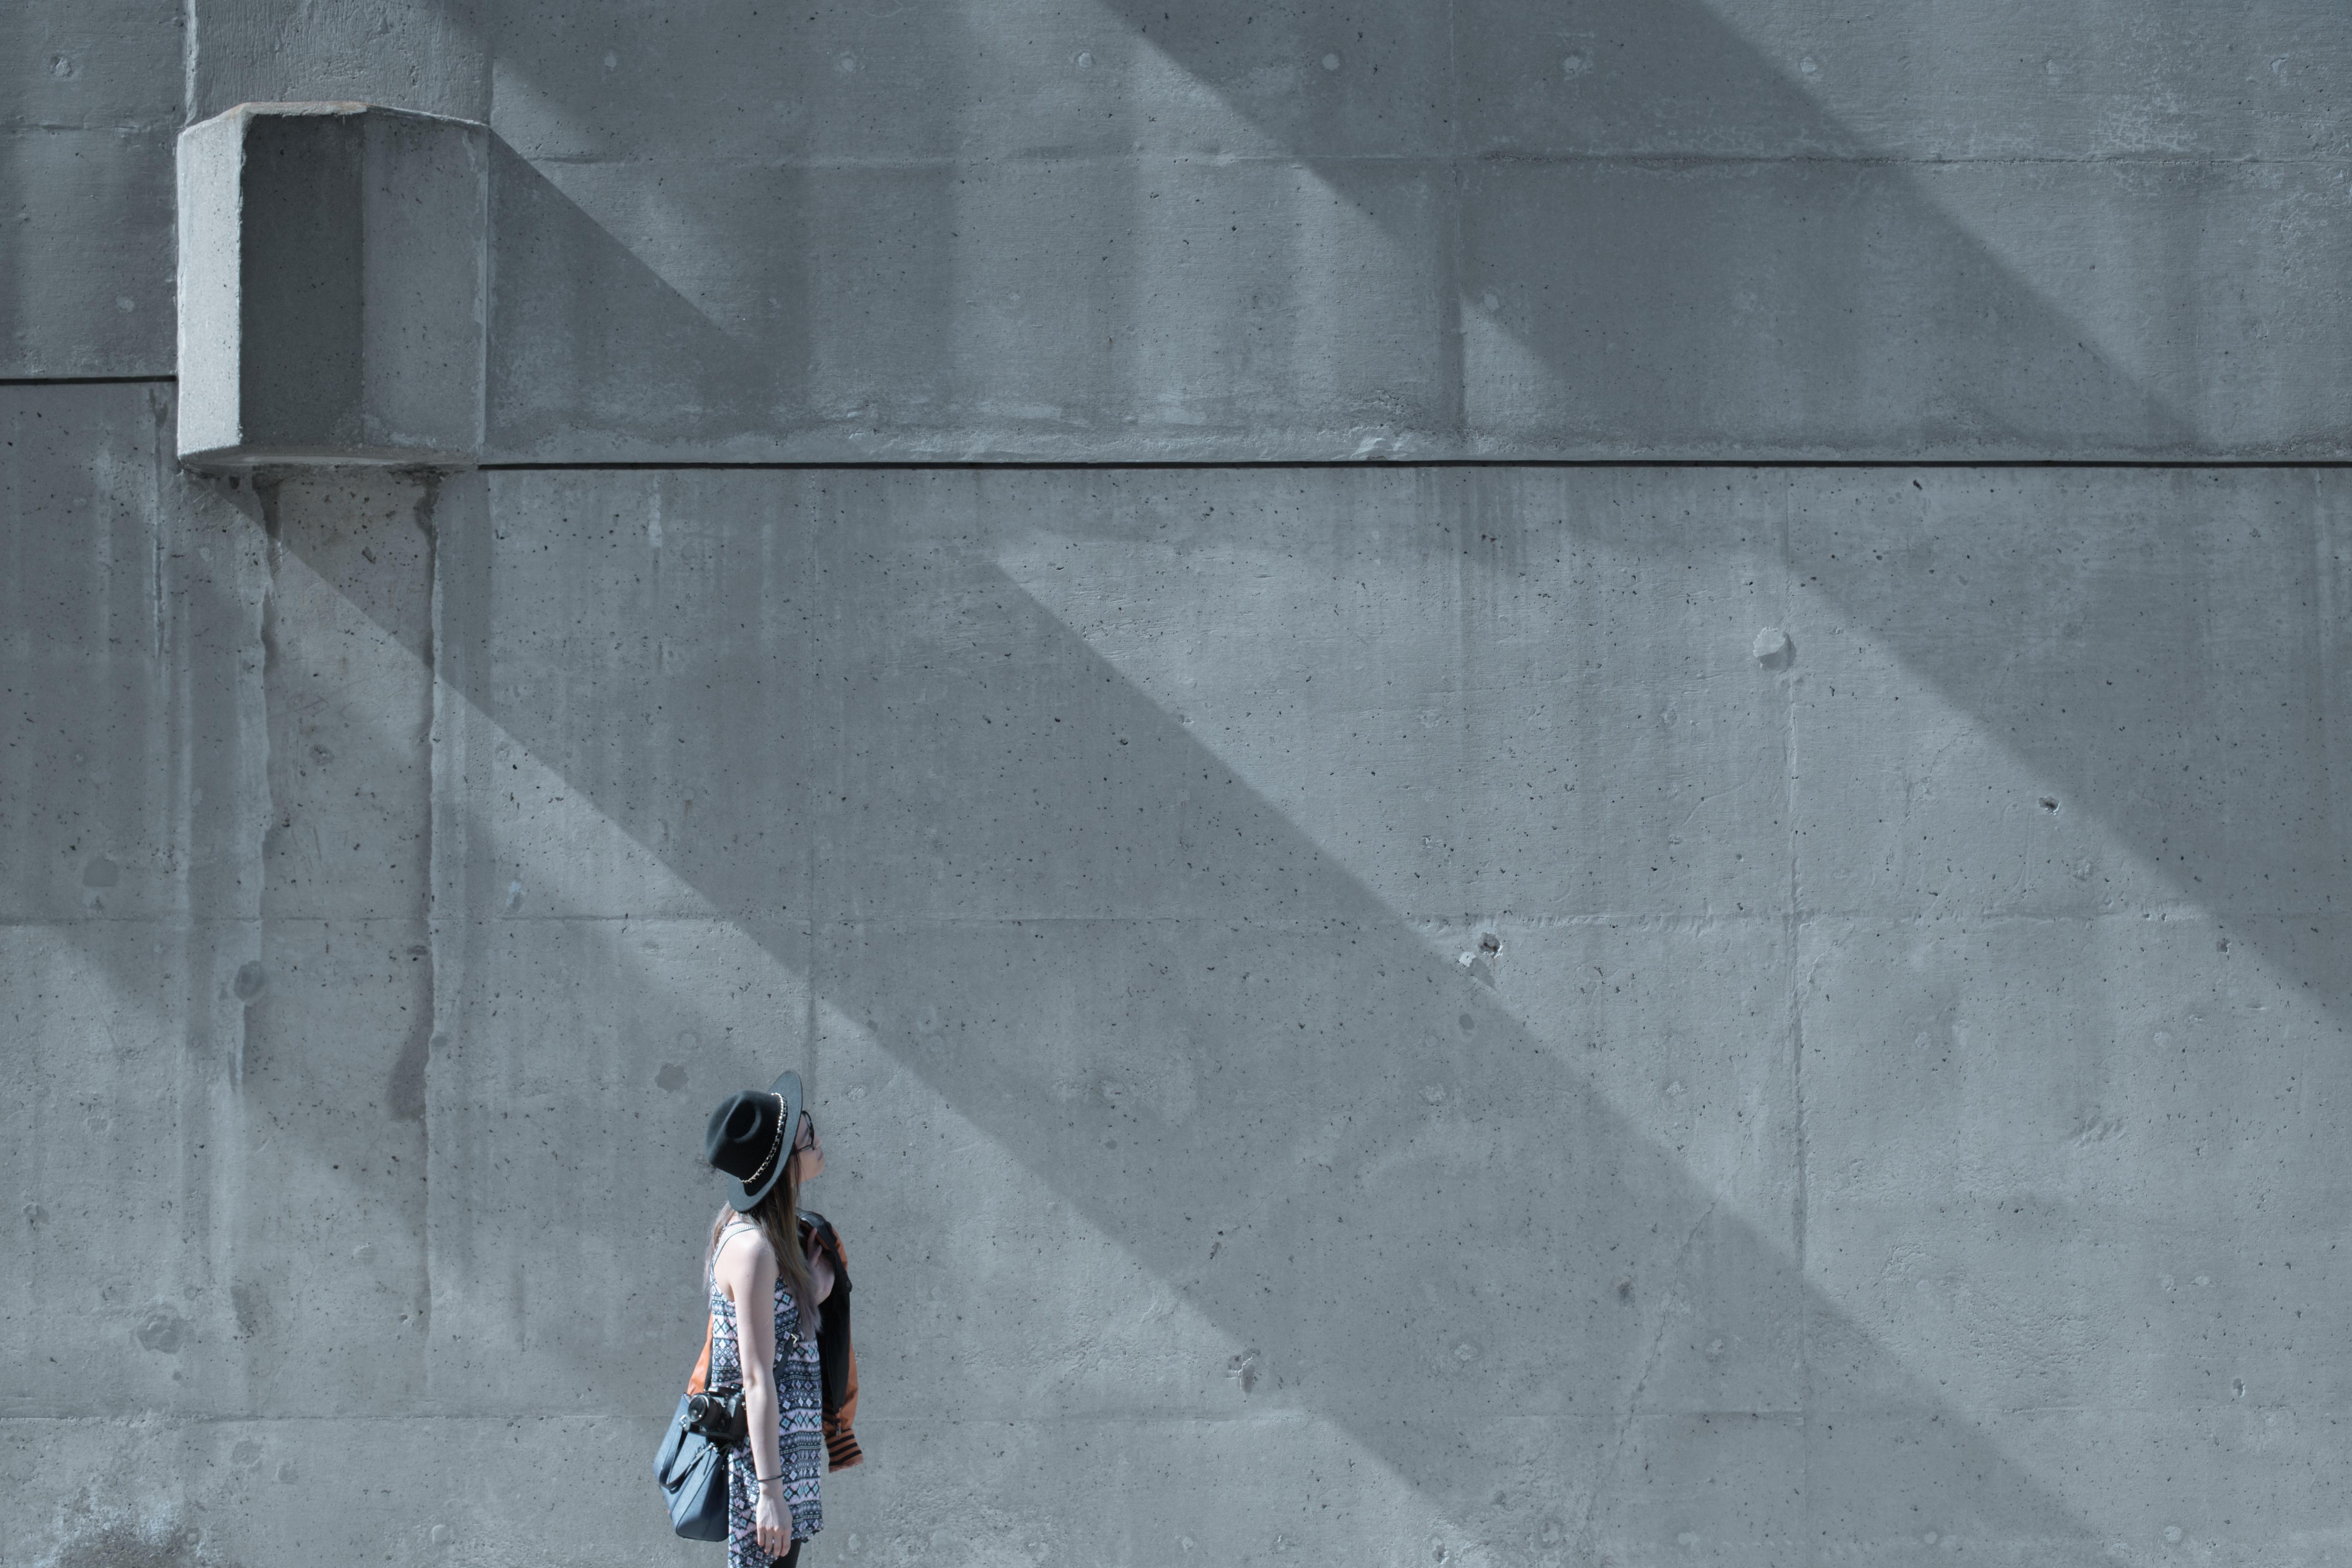 картинка серая стена на улице связи